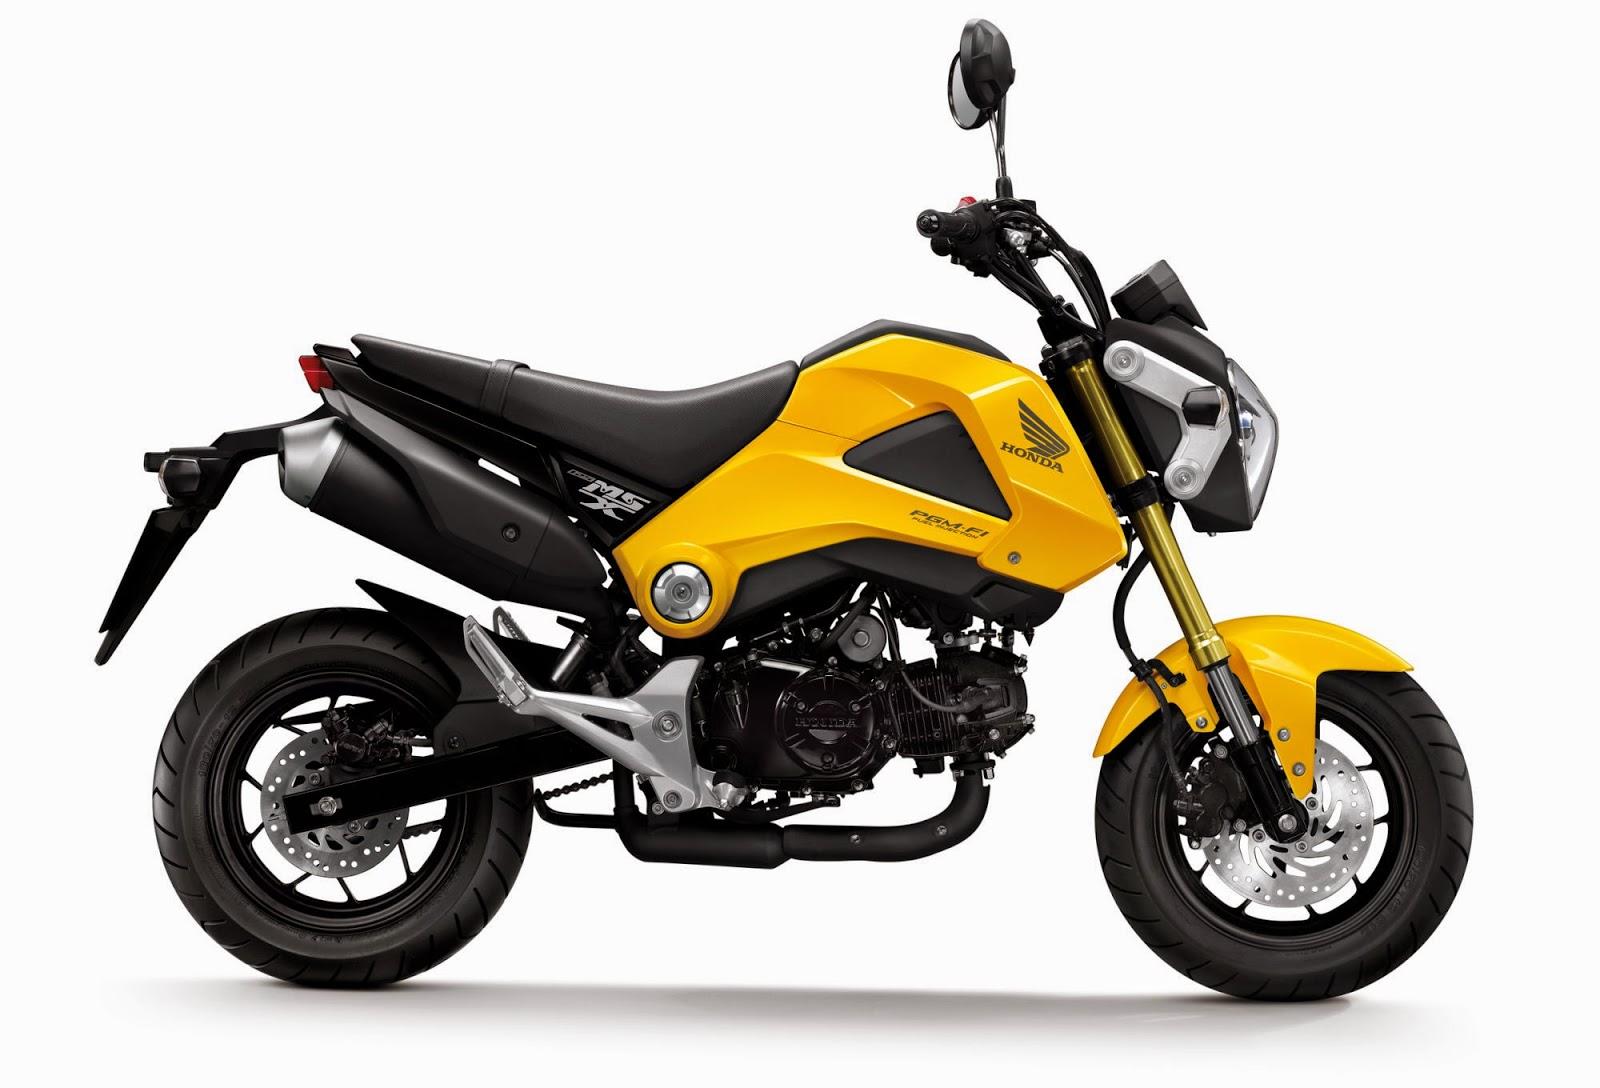 Honda msx 2015 price 2100 phnom penh motors for South motors honda us1